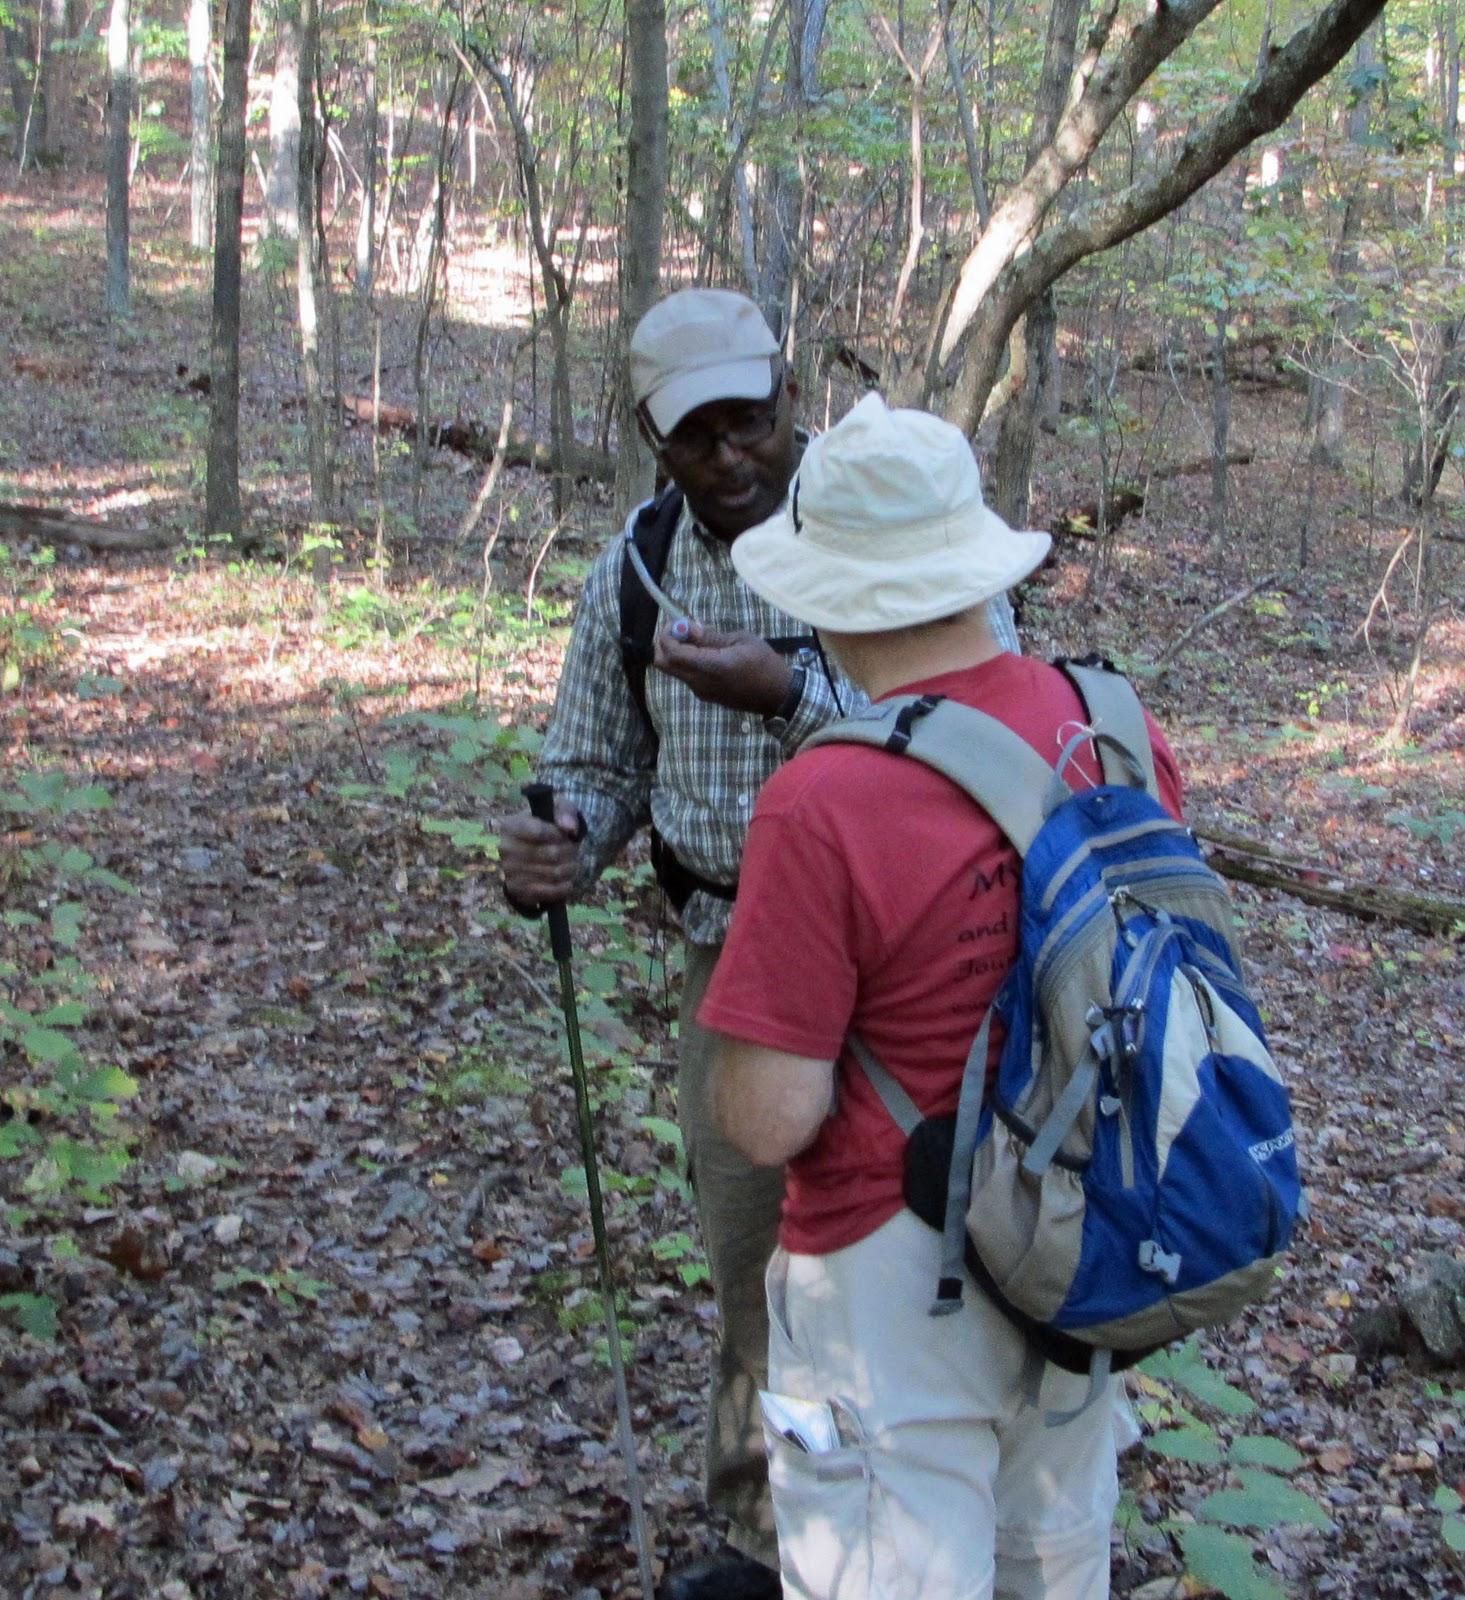 Hiking Old Rag Tips: Old Rag Mountain Hikes/Patrols By RSL: Patc Trail Patrol